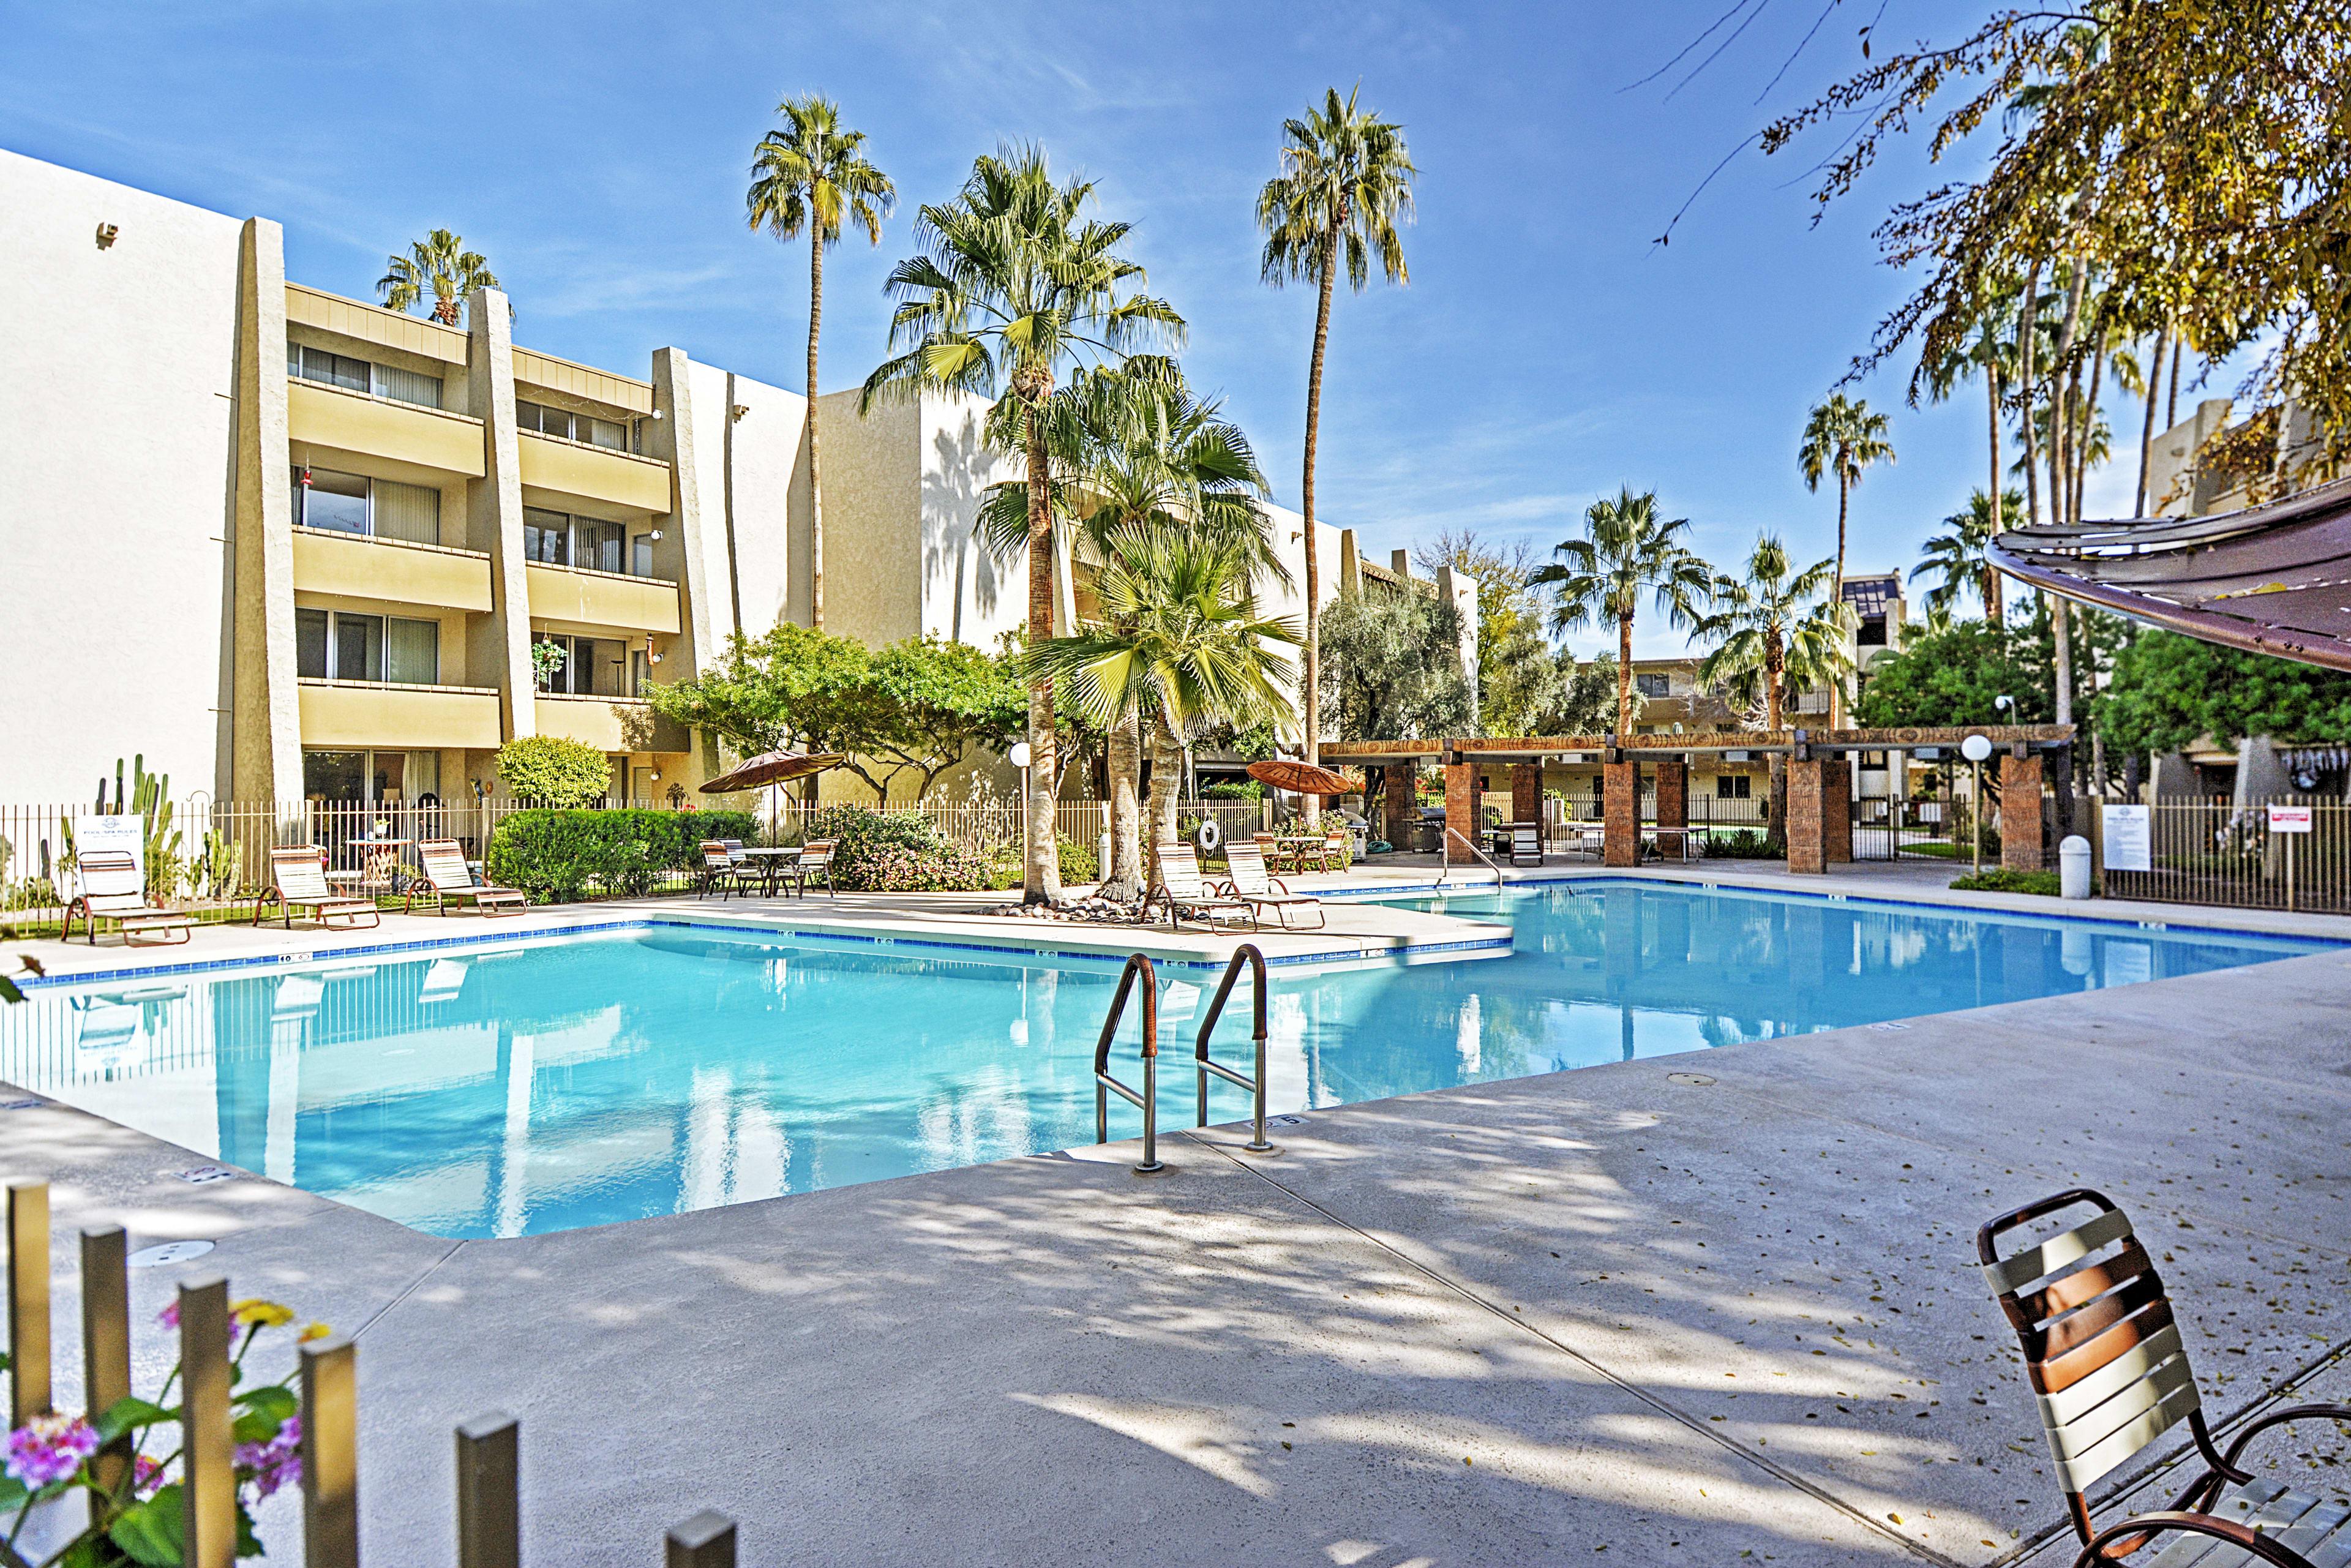 Scottsdale Vacation Rental Condo   2BR   2BA   4th Floor   1,066 Sq Ft